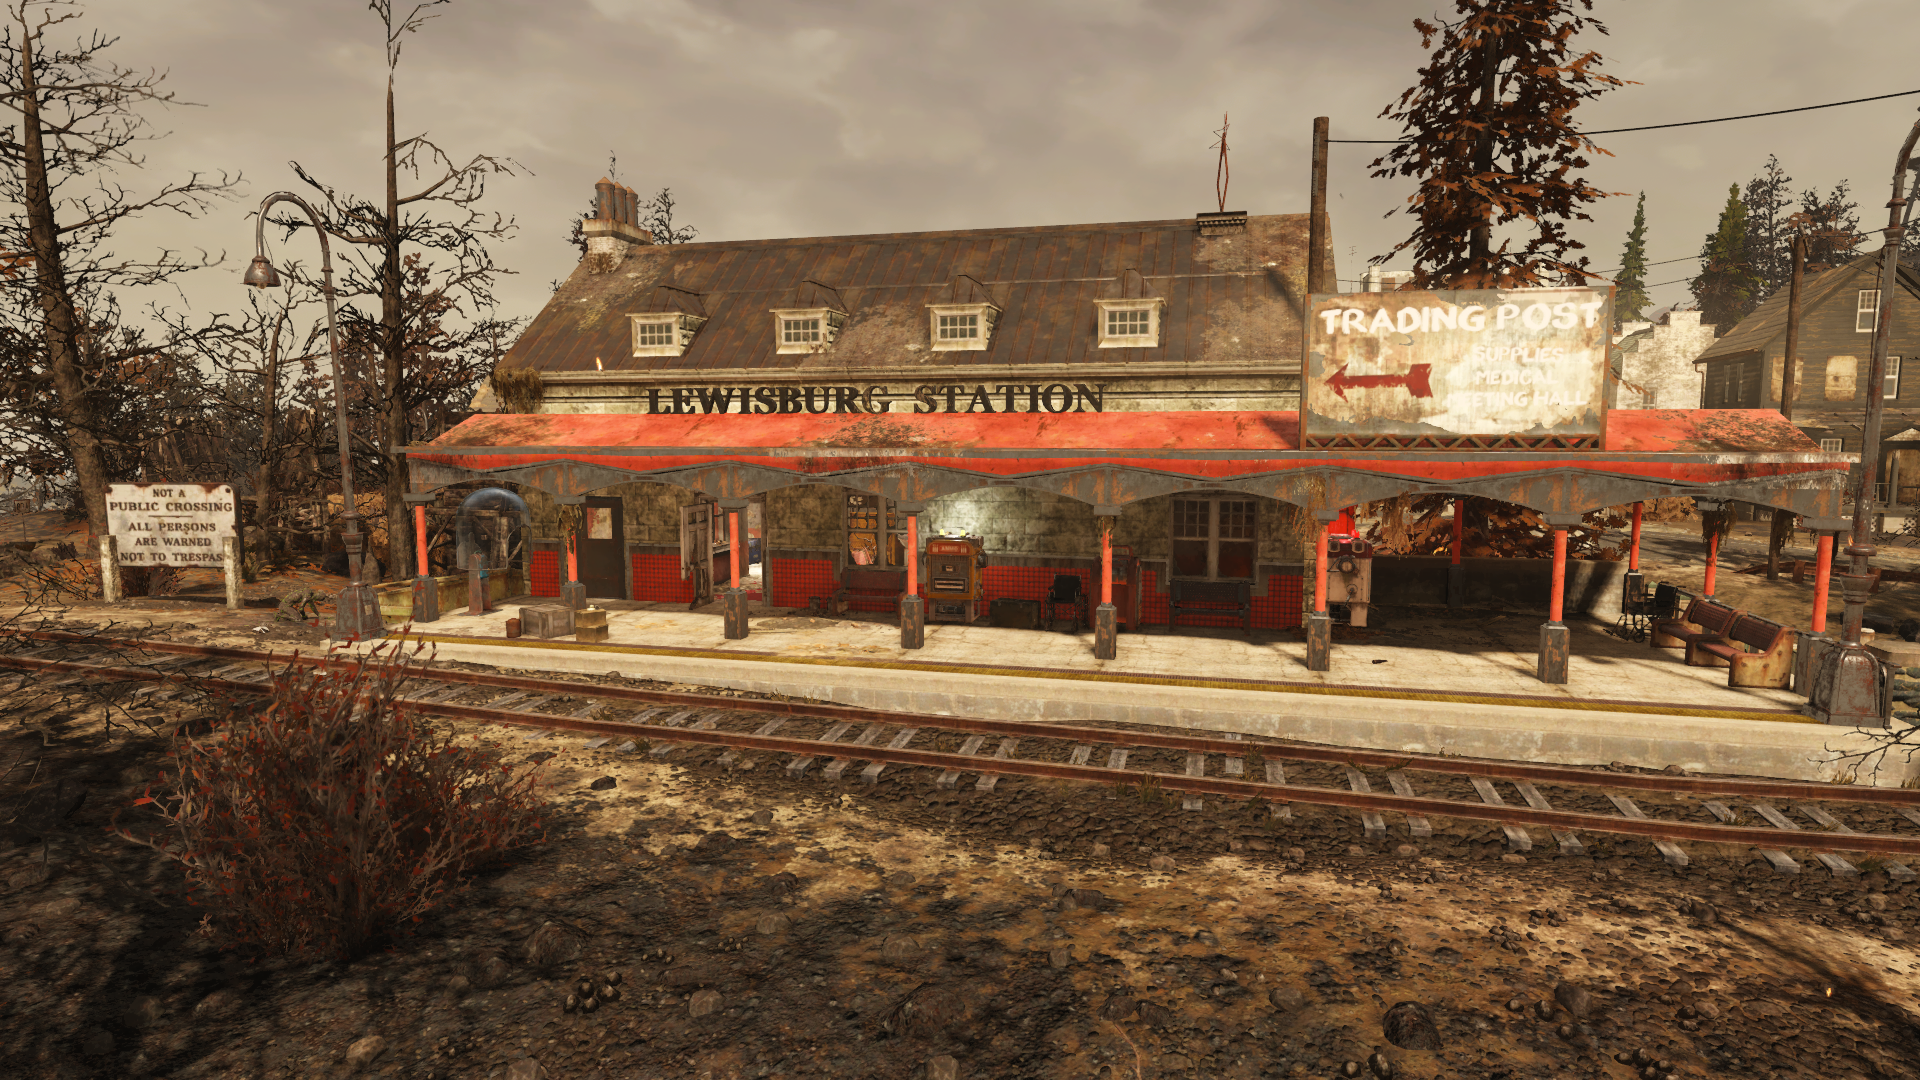 Lewisburg Station Fallout 76 Vendors